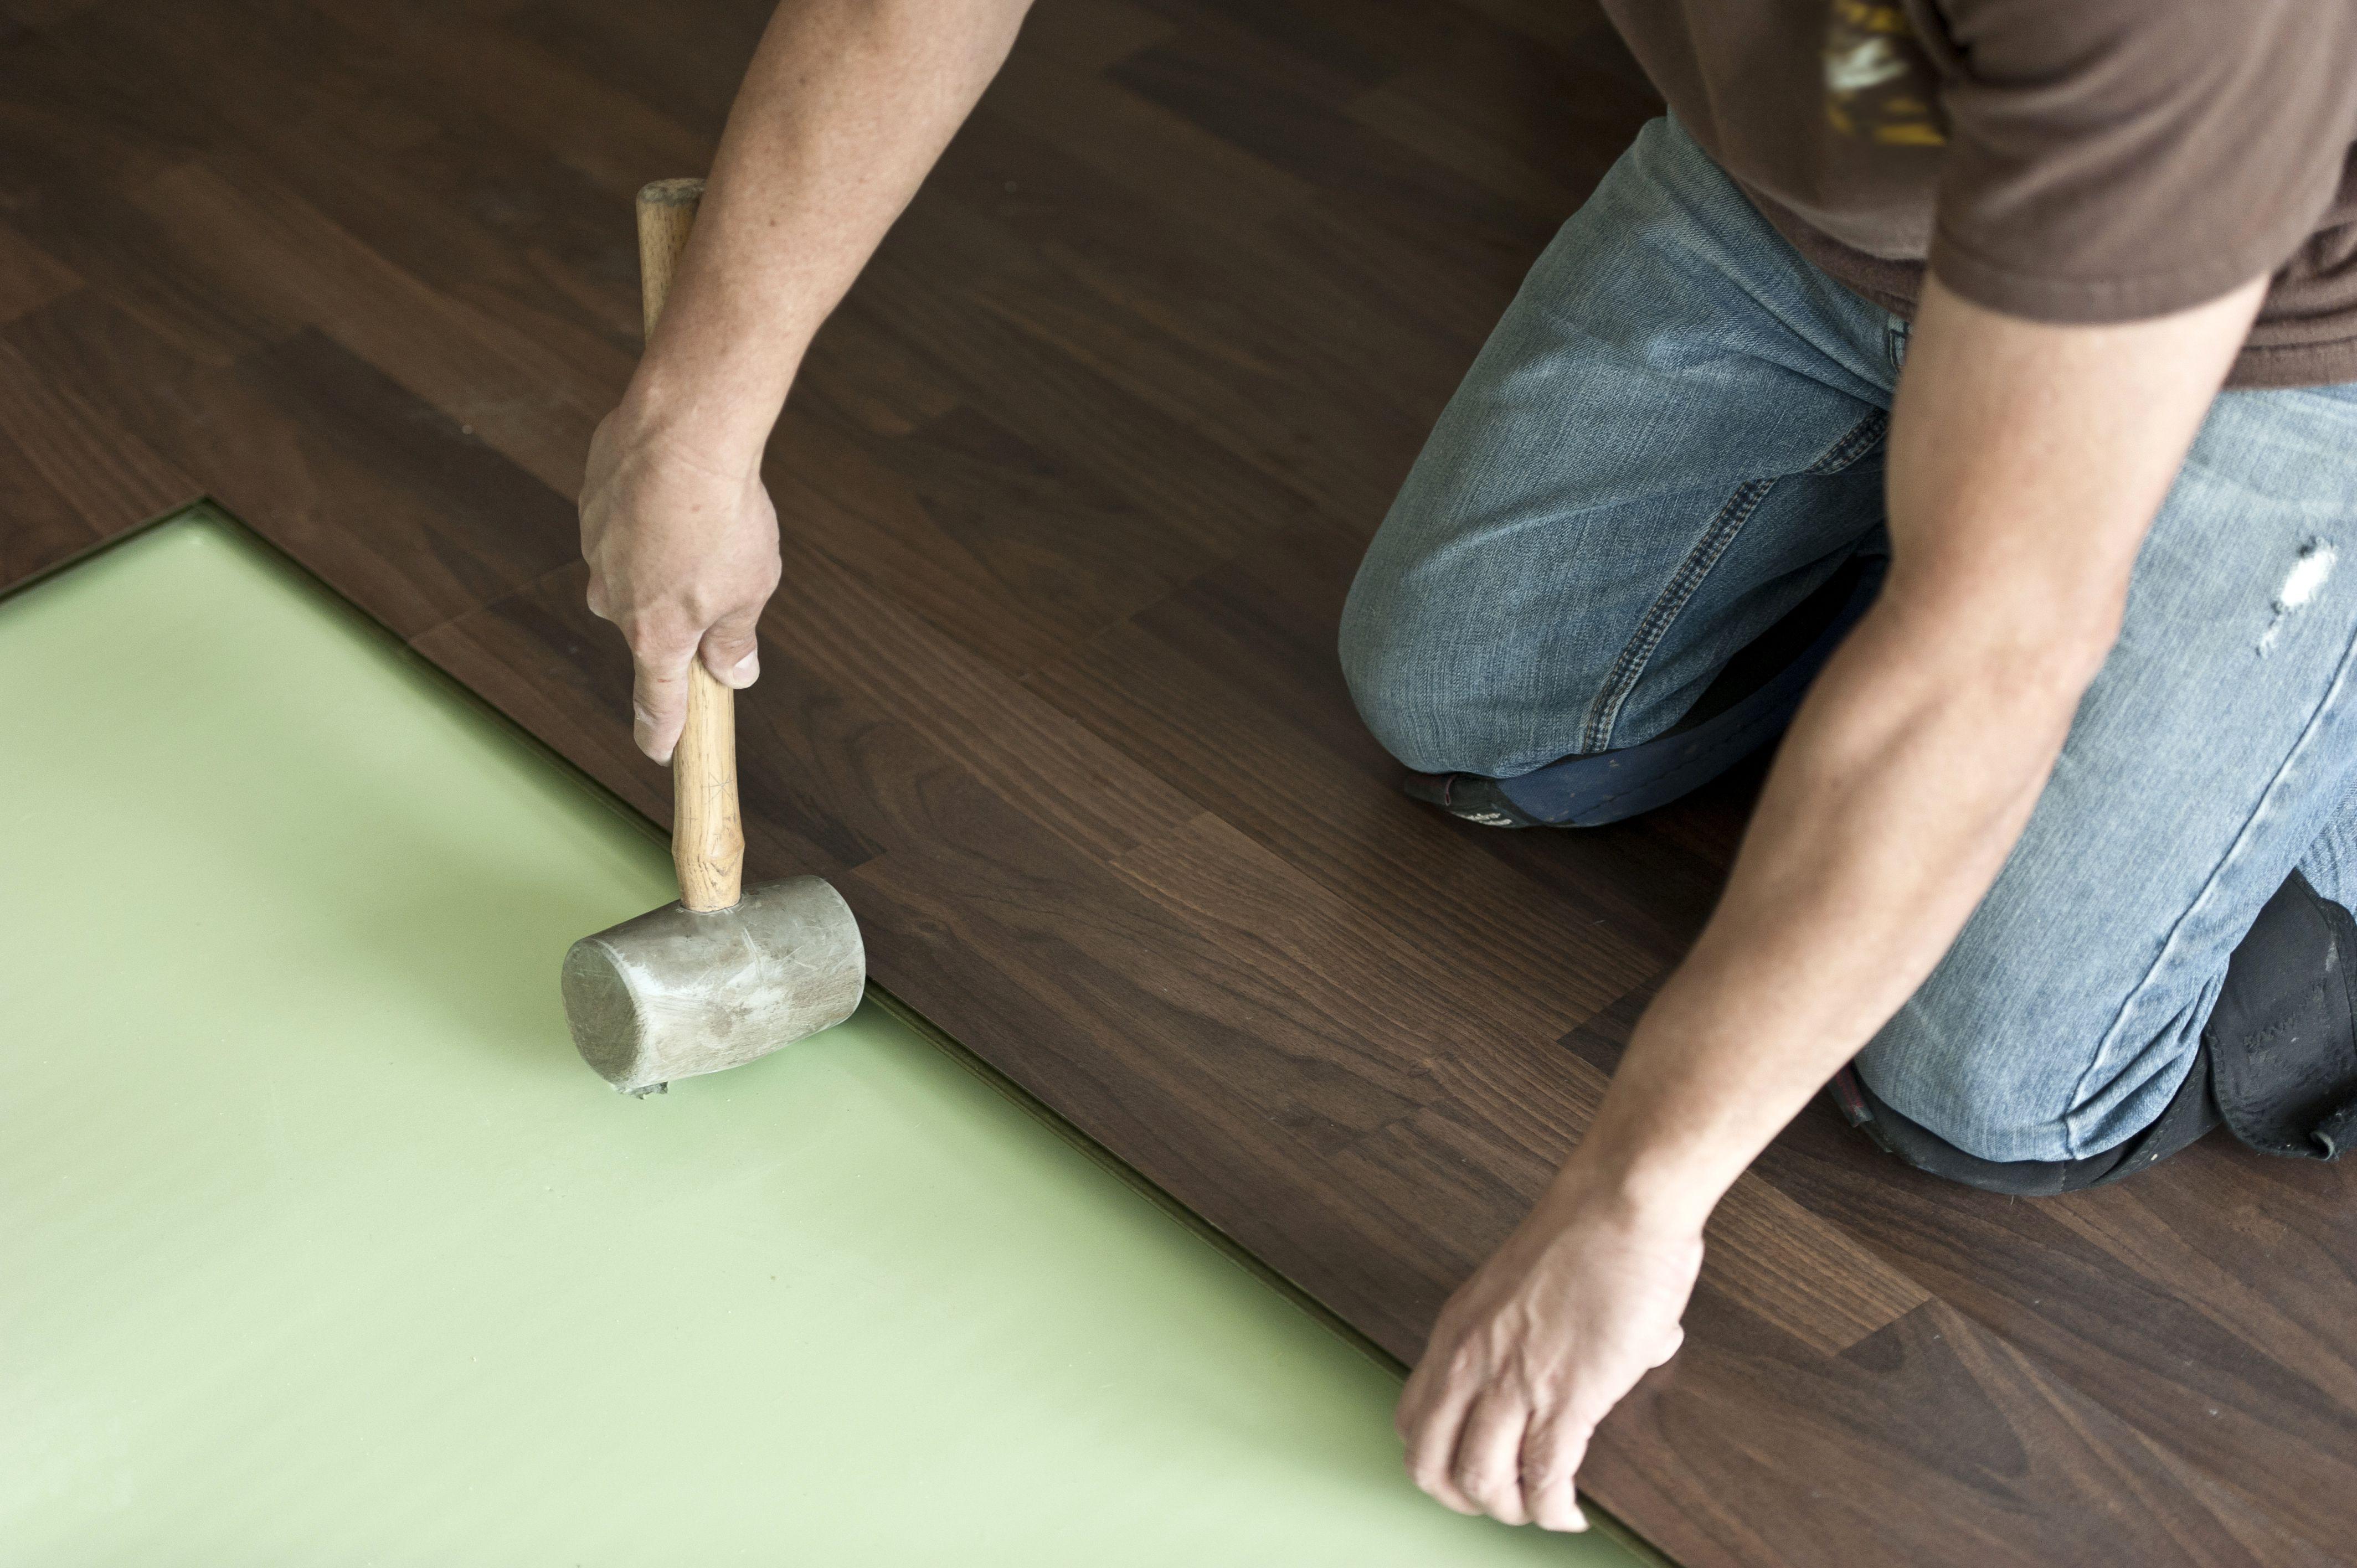 22 Spectacular Hardwood Floor Furniture Protectors Adhesive Felt Pads 2021 free download hardwood floor furniture protectors adhesive felt pads of can a foam pad be use under solid hardwood flooring for installing hardwood floor 155149312 57e967d45f9b586c35ade84a